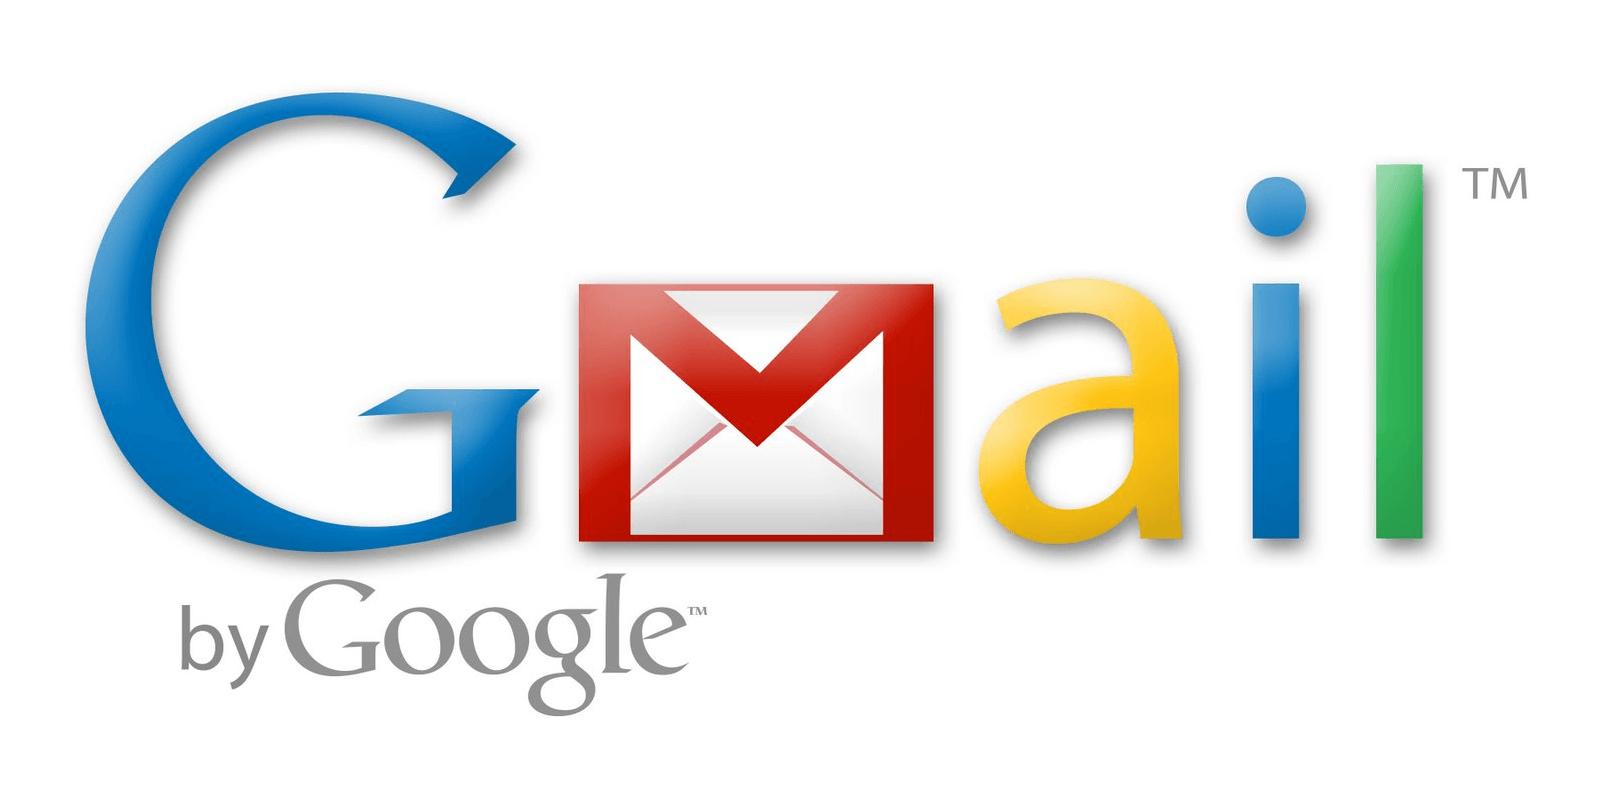 Gmail iniciar sesion, crear cuenta de correo